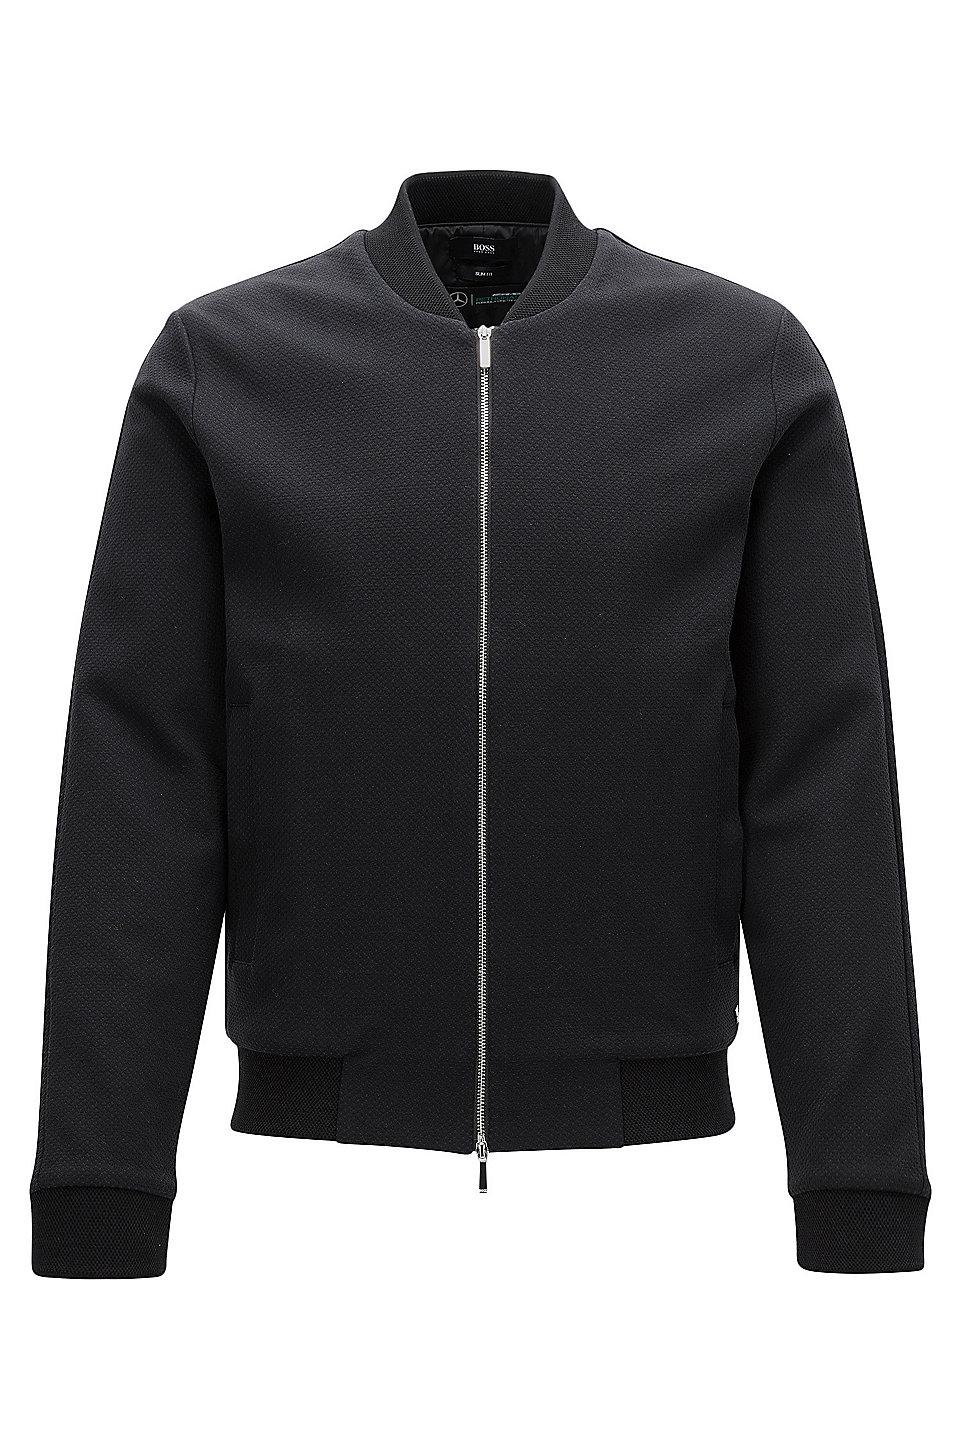 Boss mercedes benz cotton zip jacket soule for Mercedes benz leather jacket